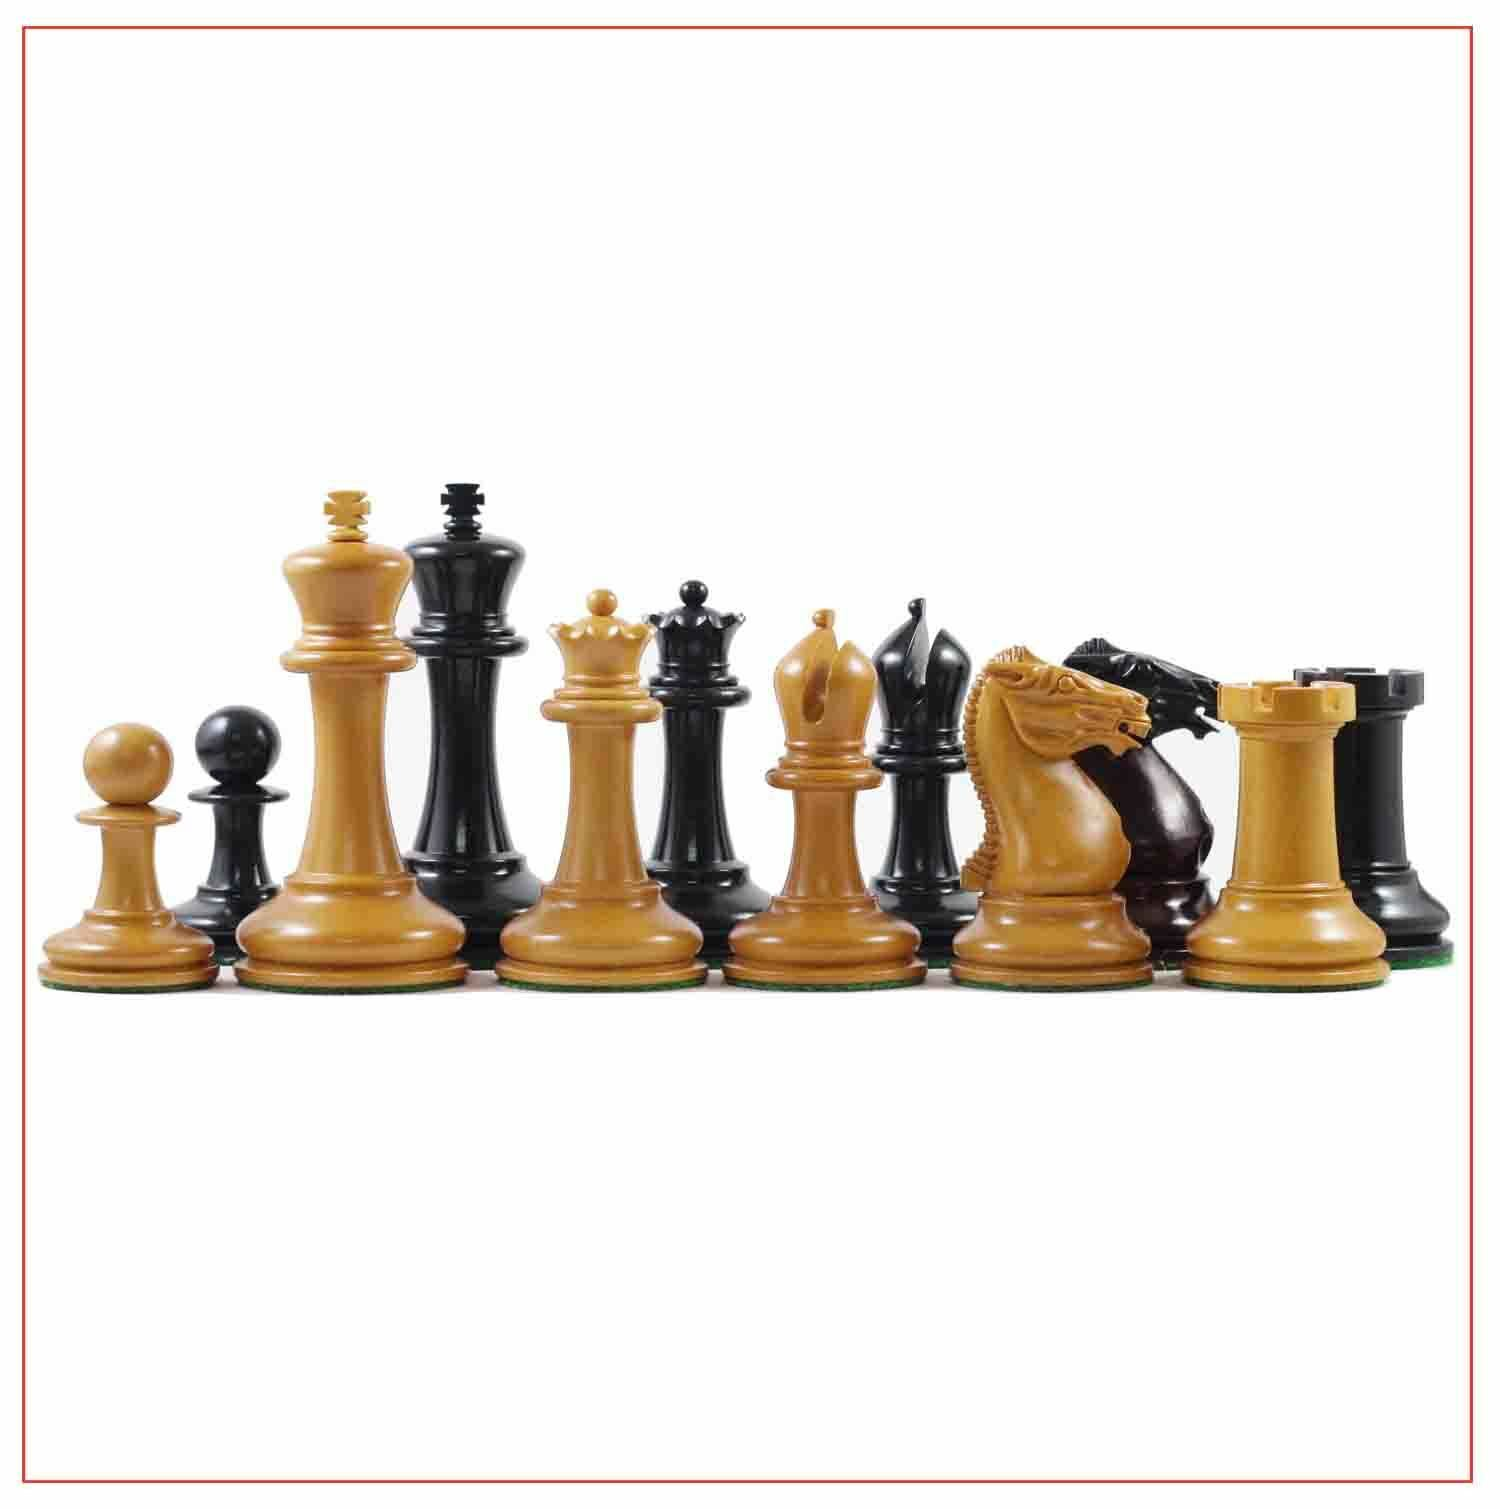 Walter Grimshaw 1854 Circa Reproduction Reproduction Reproduction Staunton Antiqued Ebony Chess Set 84d61a